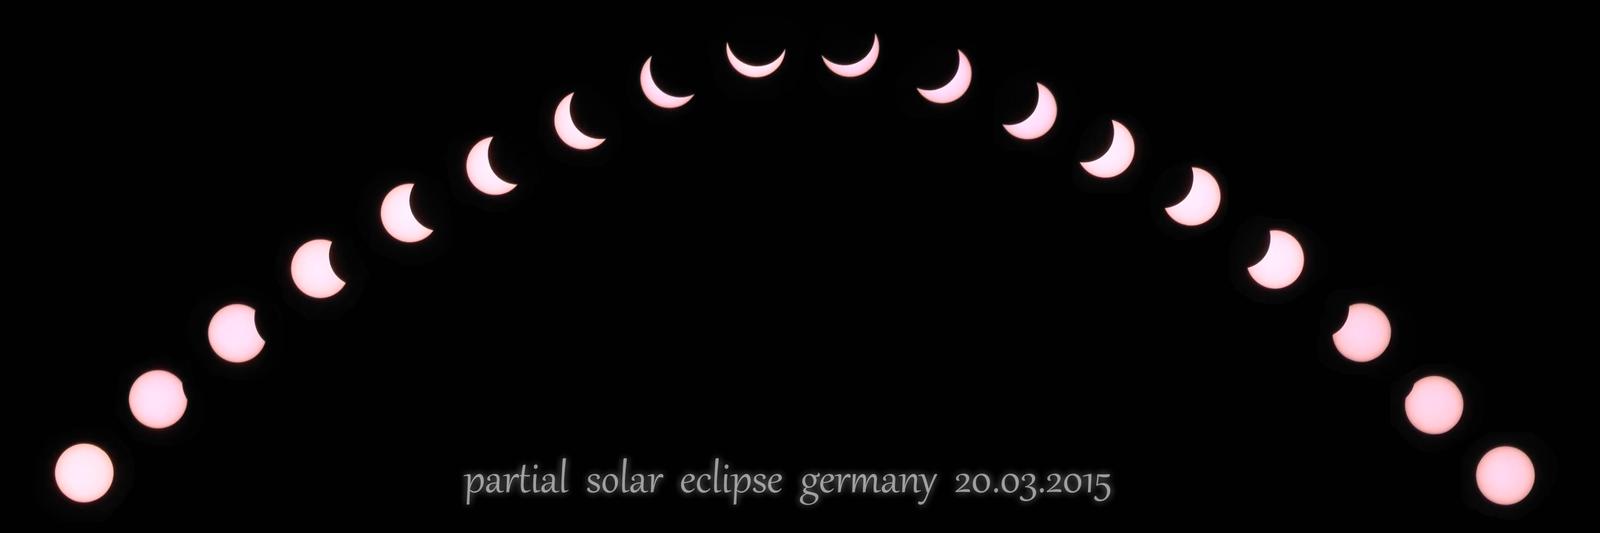 partial solar eclipse germany 2015 by anineko